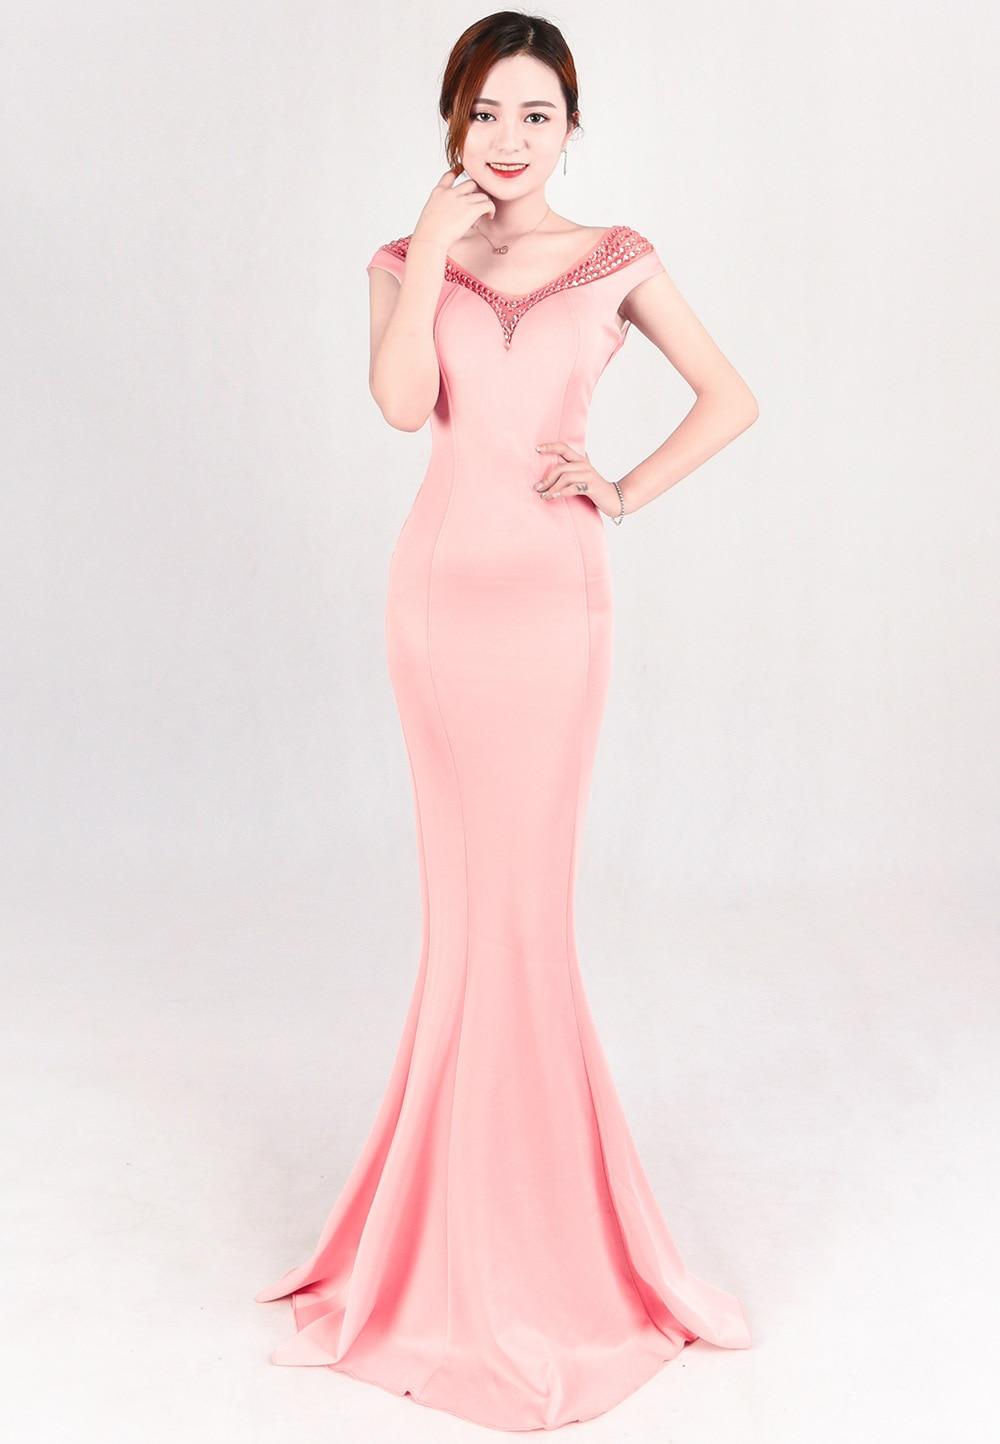 2018 New Crystal Party Dresses Pink Women Maxi Dess Deep V Backless Sleeveless Bodycon Mermaid Elagant Ladies Wedding Vestidos